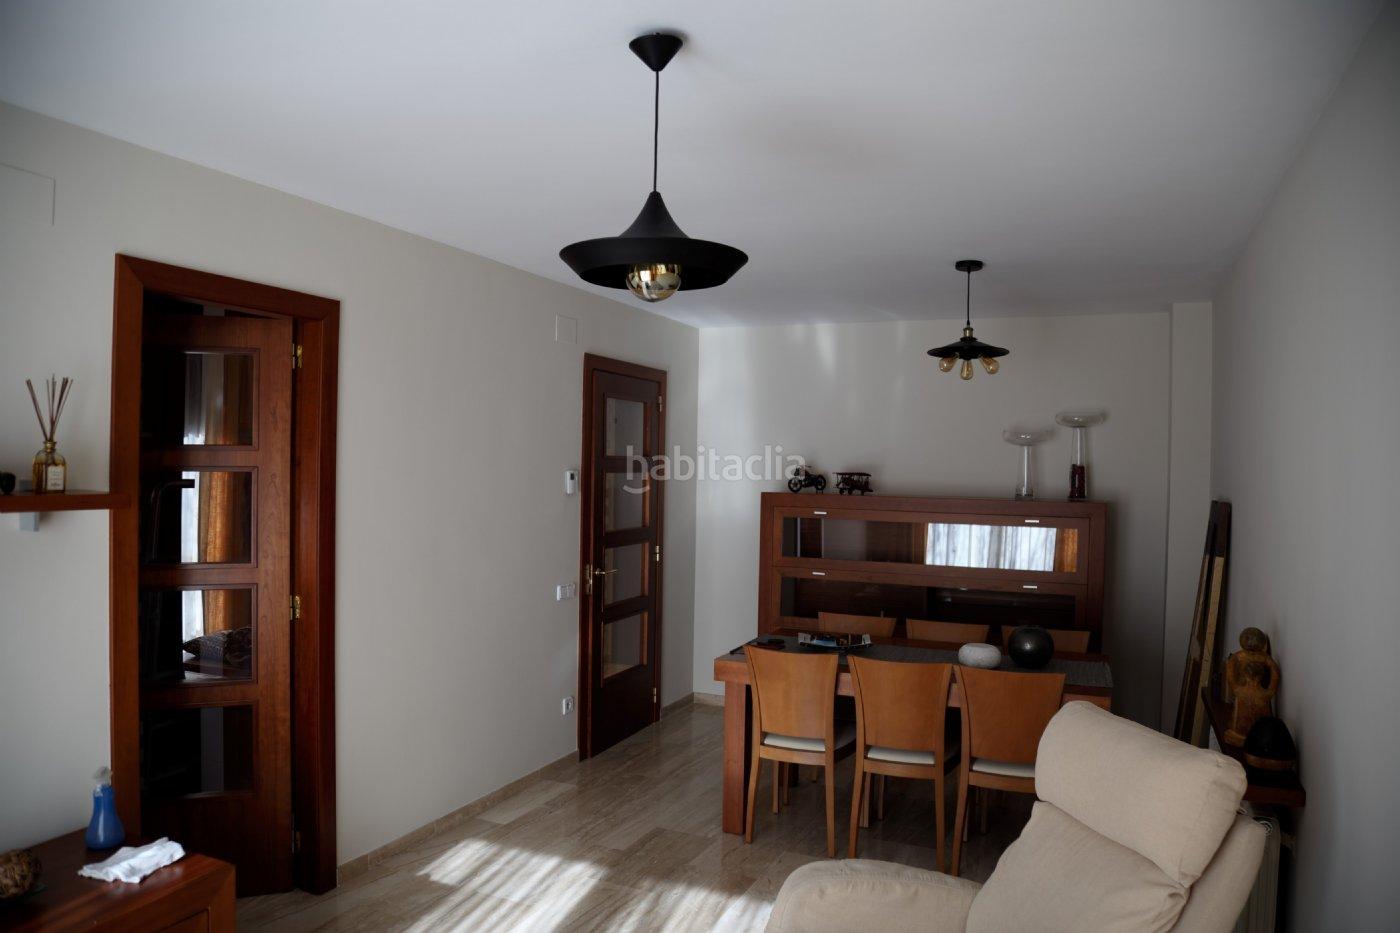 Alquiler piso por 950 en carrer terrassa alquiler d plex for Pisos alquiler particulares terrassa